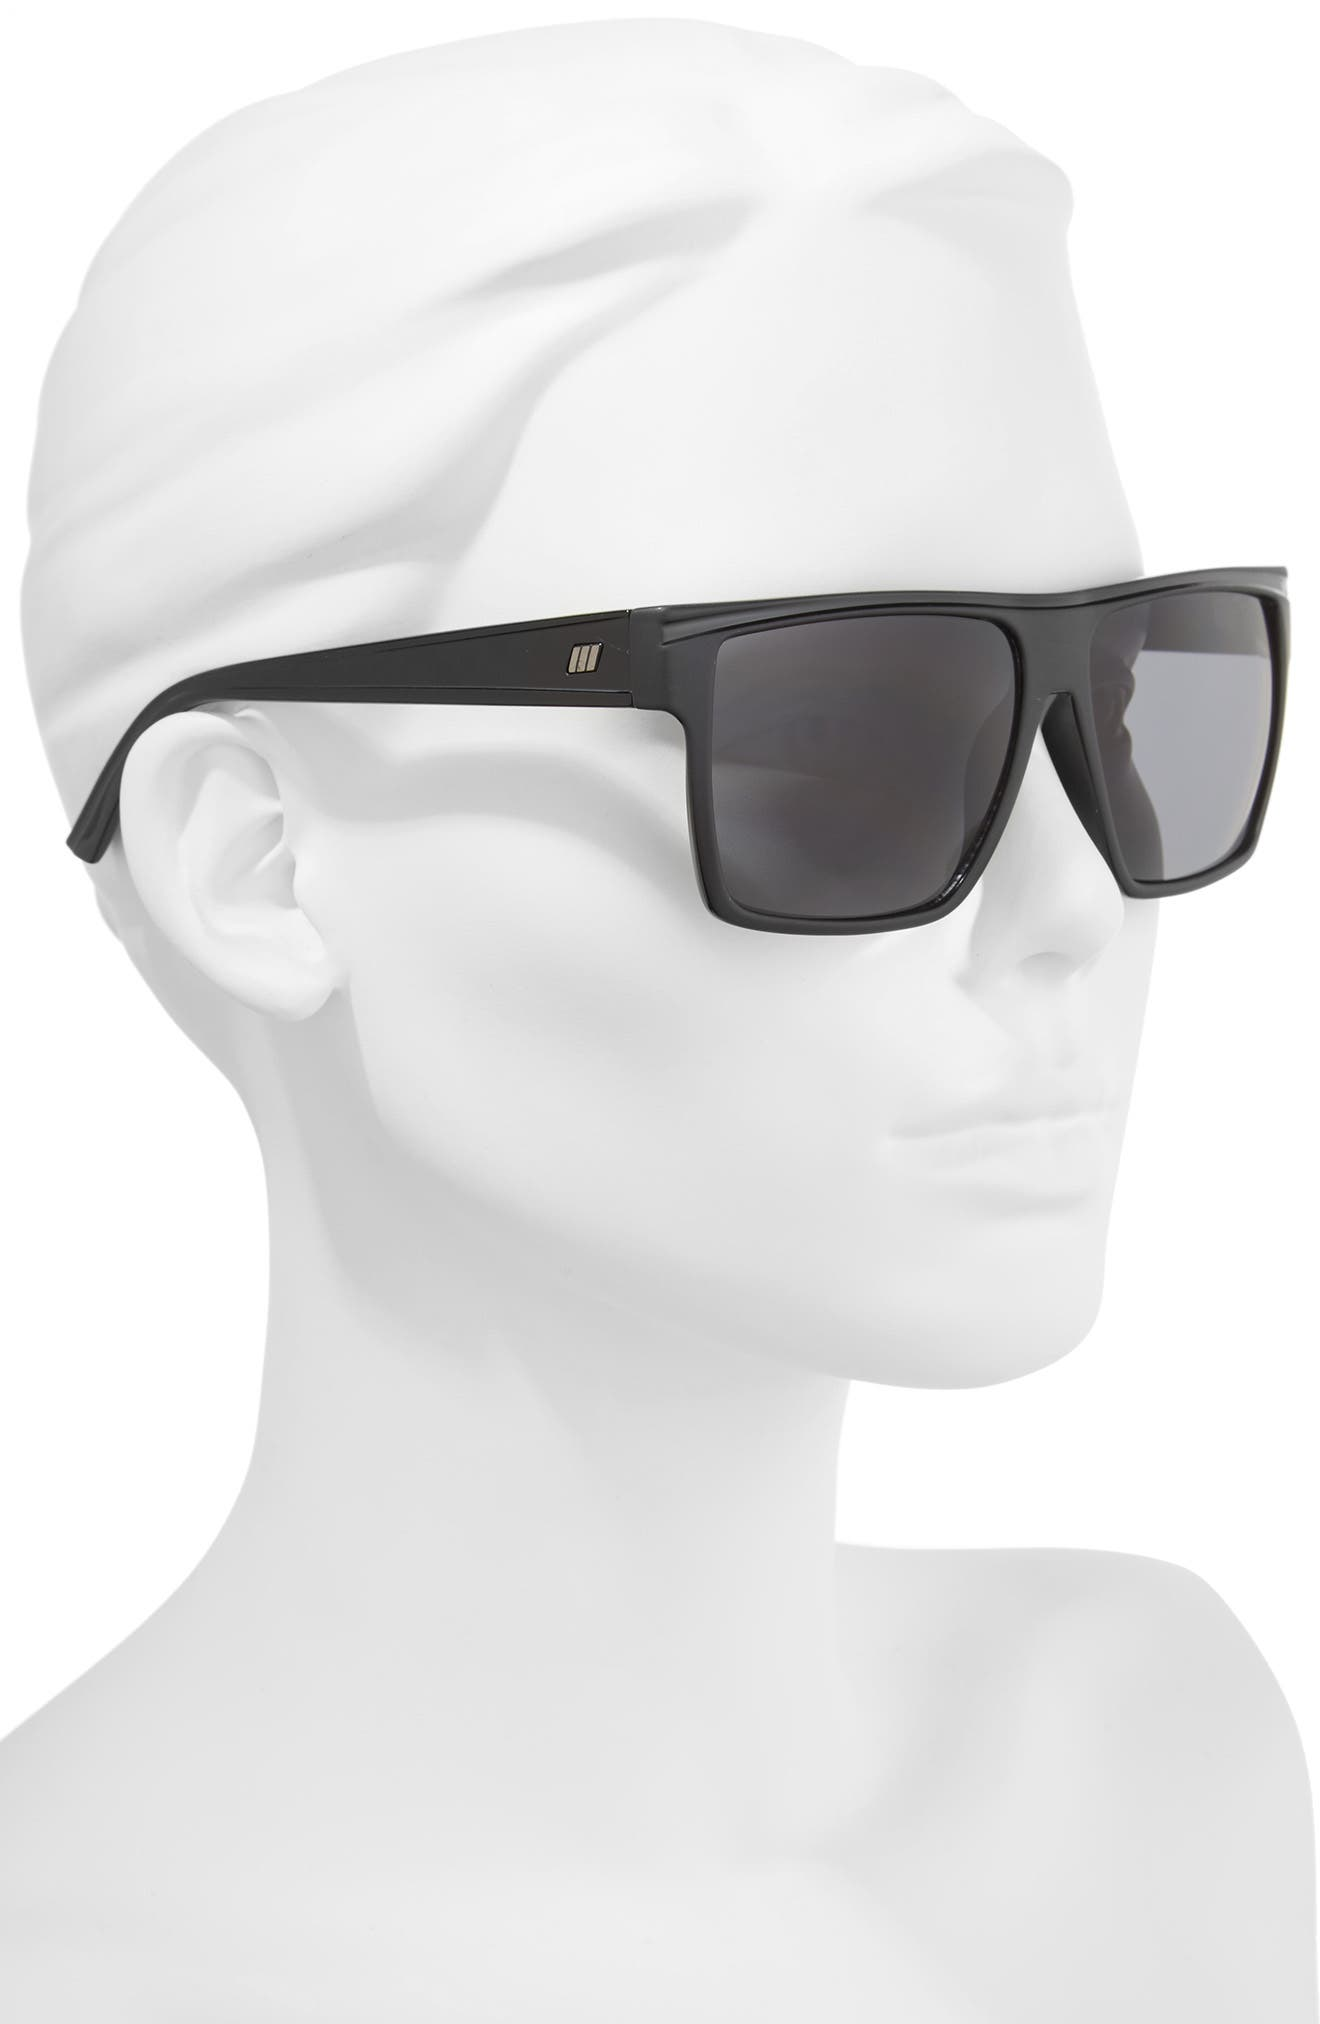 Dirty Magic 56mm Rectangle Sunglasses,                             Alternate thumbnail 2, color,                             Matte Black